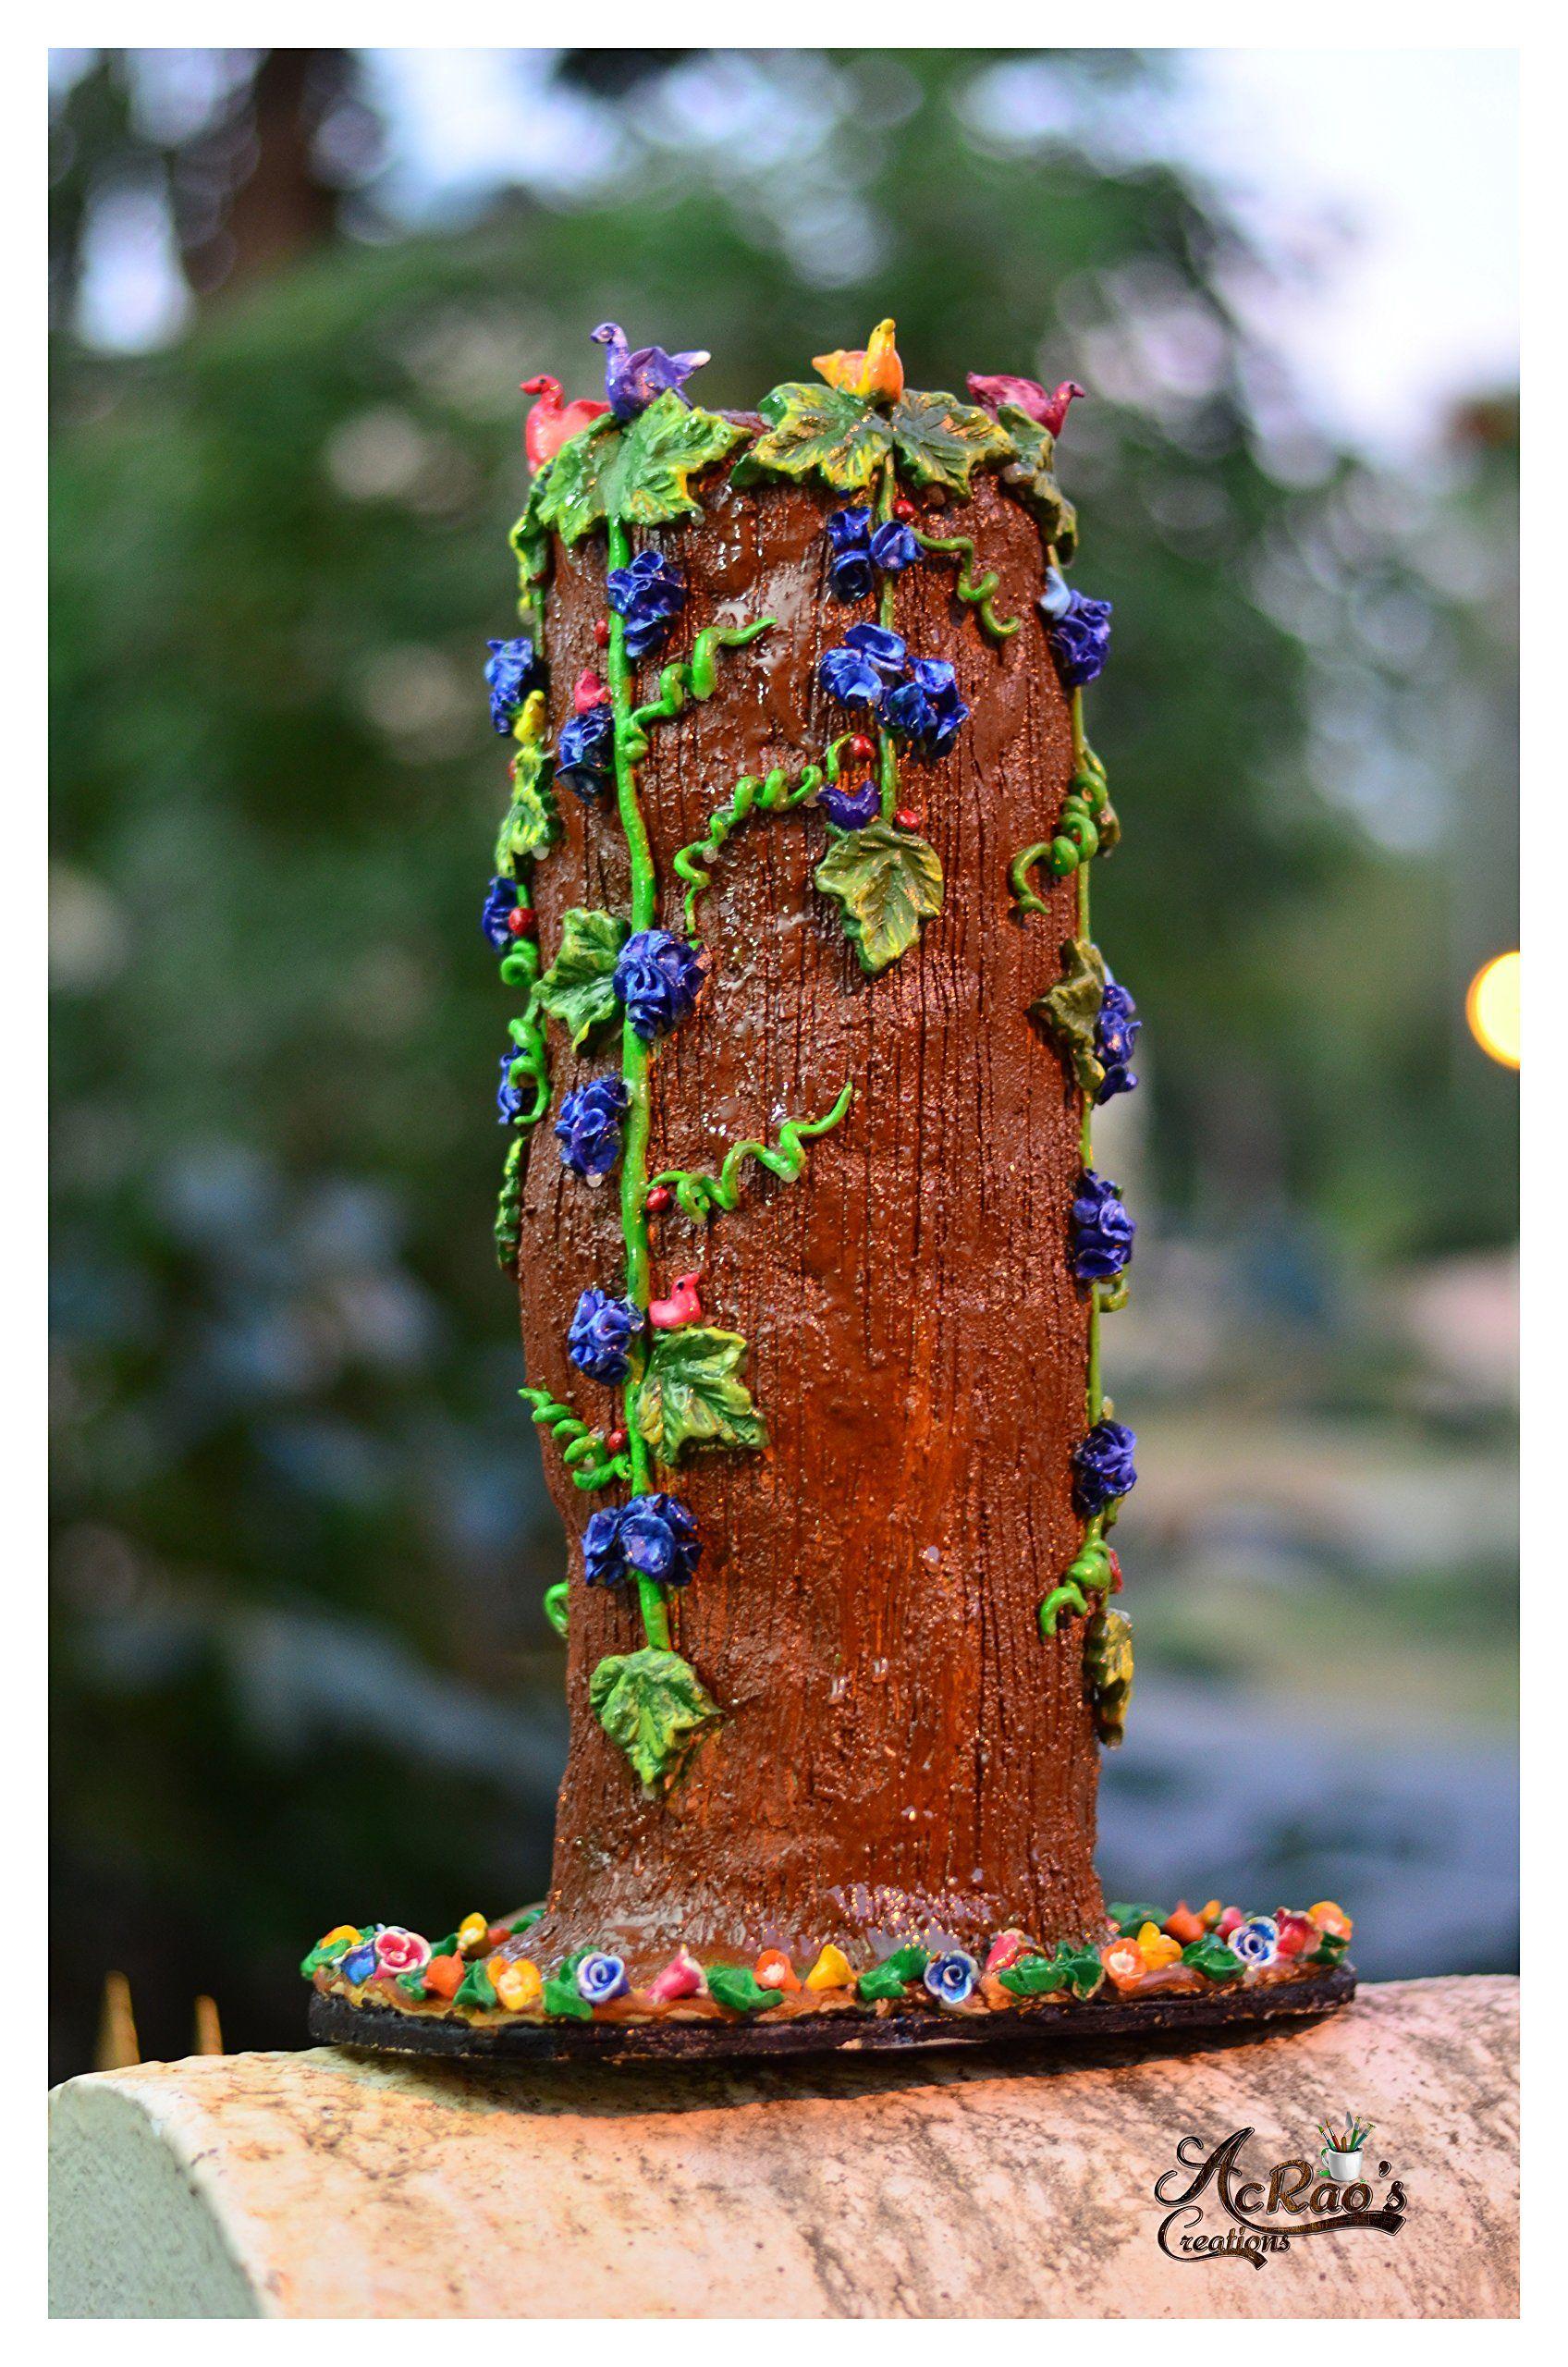 Wood log theme flower vase decorative case clay vase home decor wood log theme flower vase decorative case clay vase home decor wedding gift unique themed flower vase wood log this unique themed flower vase is made of reviewsmspy